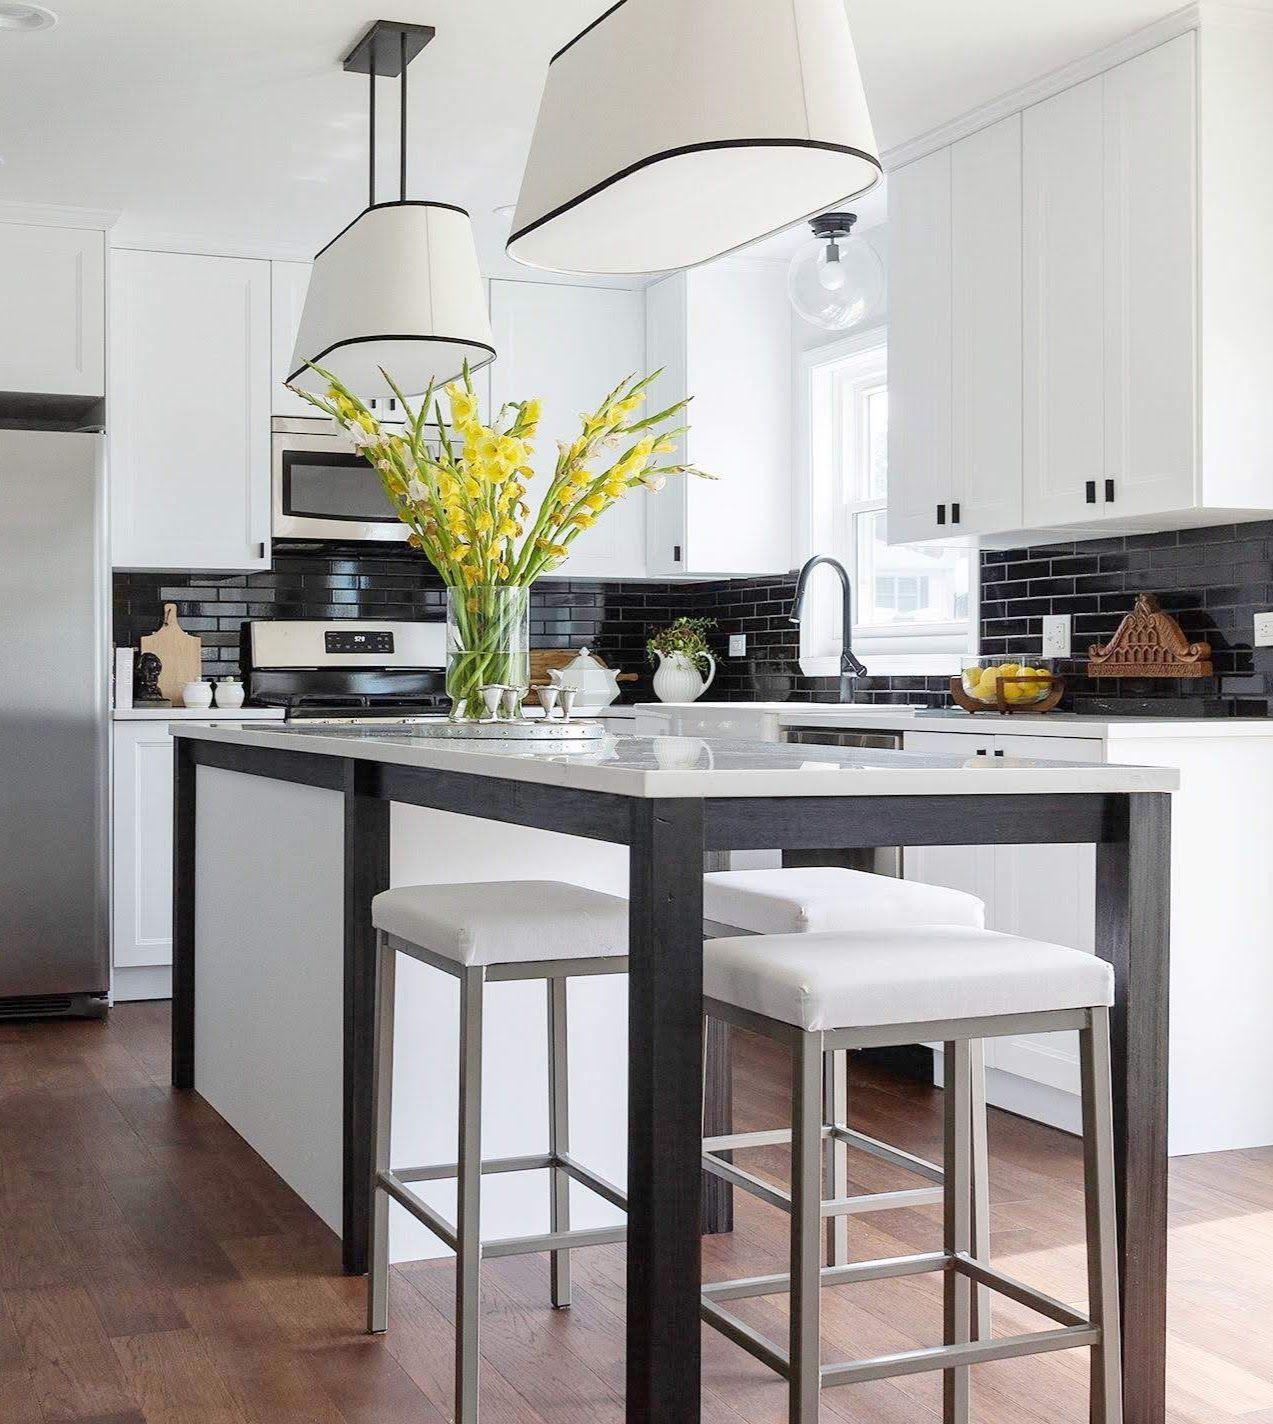 Axstad Black and White IKEA Kitchen White ikea kitchen